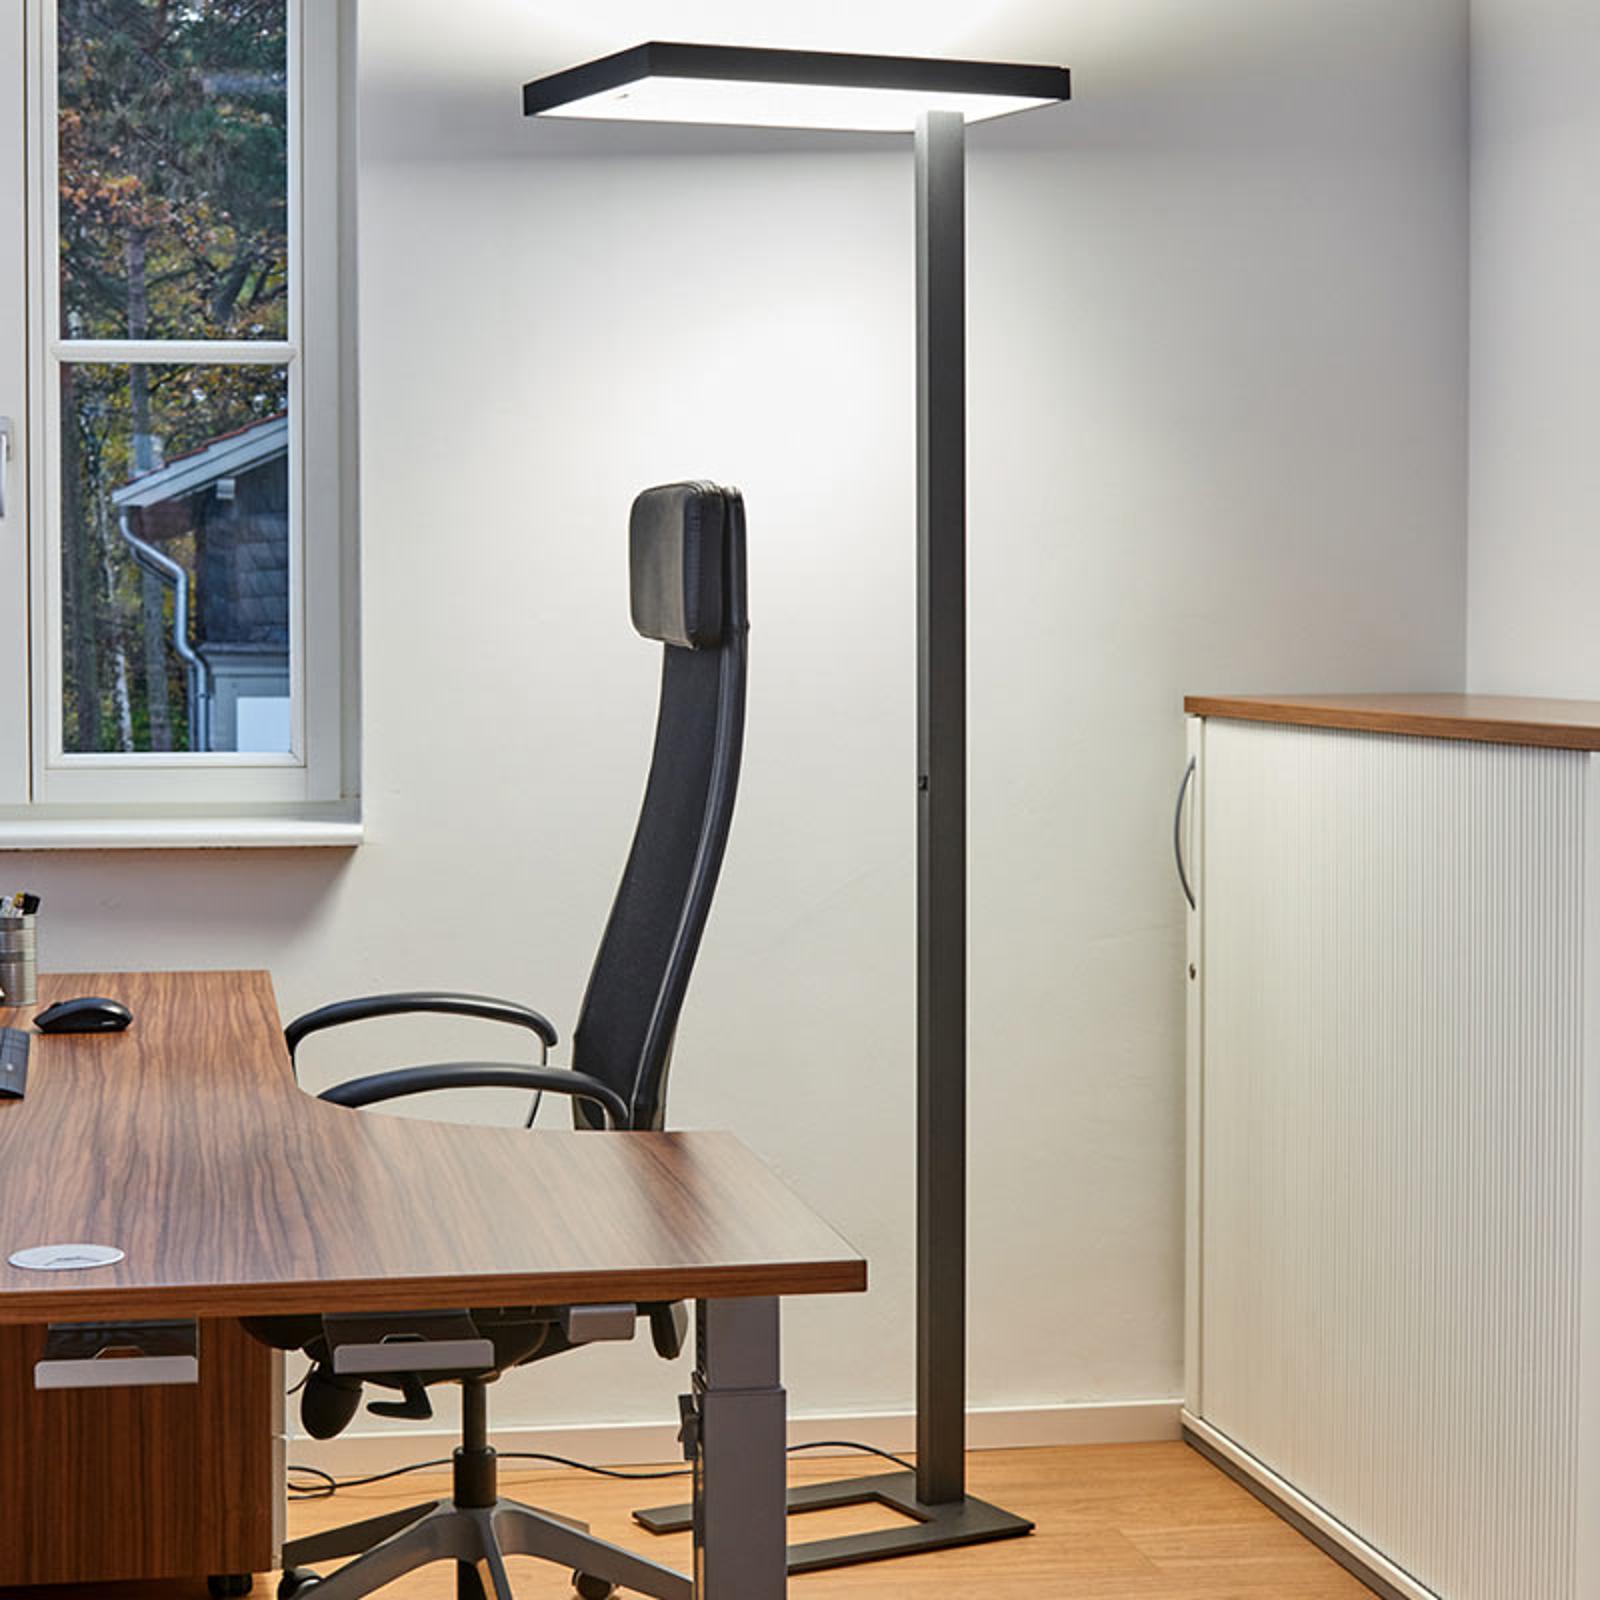 Biurowa lampa stojąca LED Lola, 4.000 K, DALI